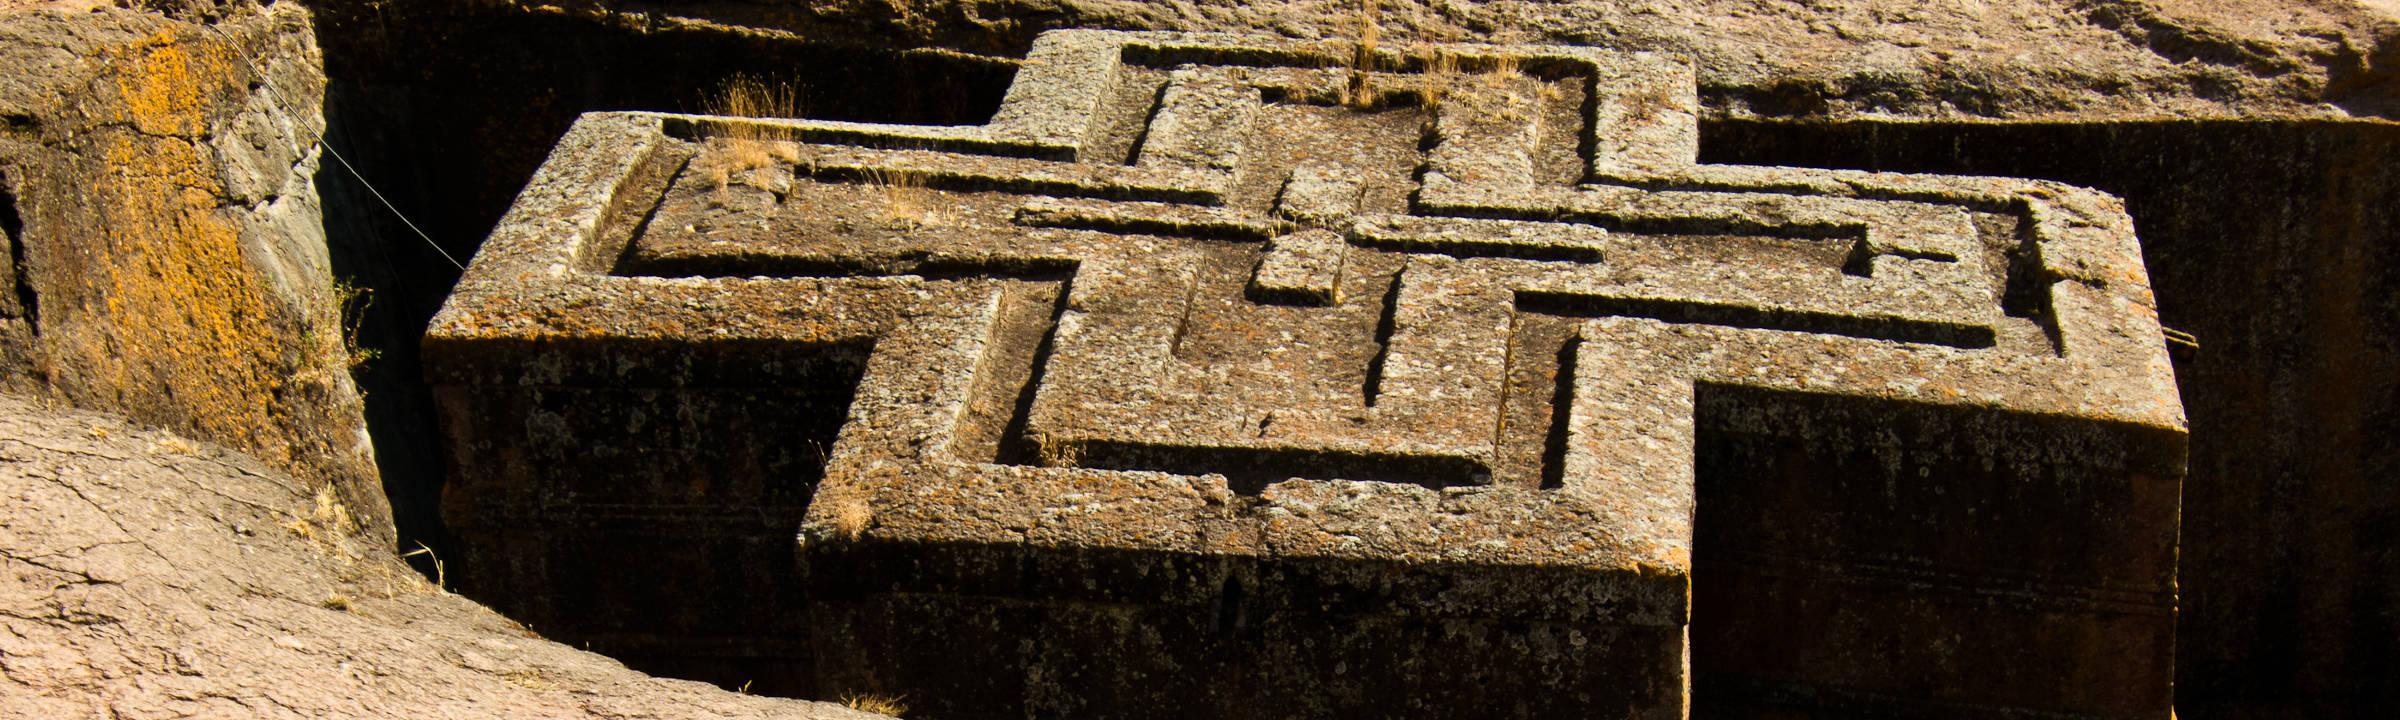 Ethiopia: My Pilgrimage to Lalibela Part 2